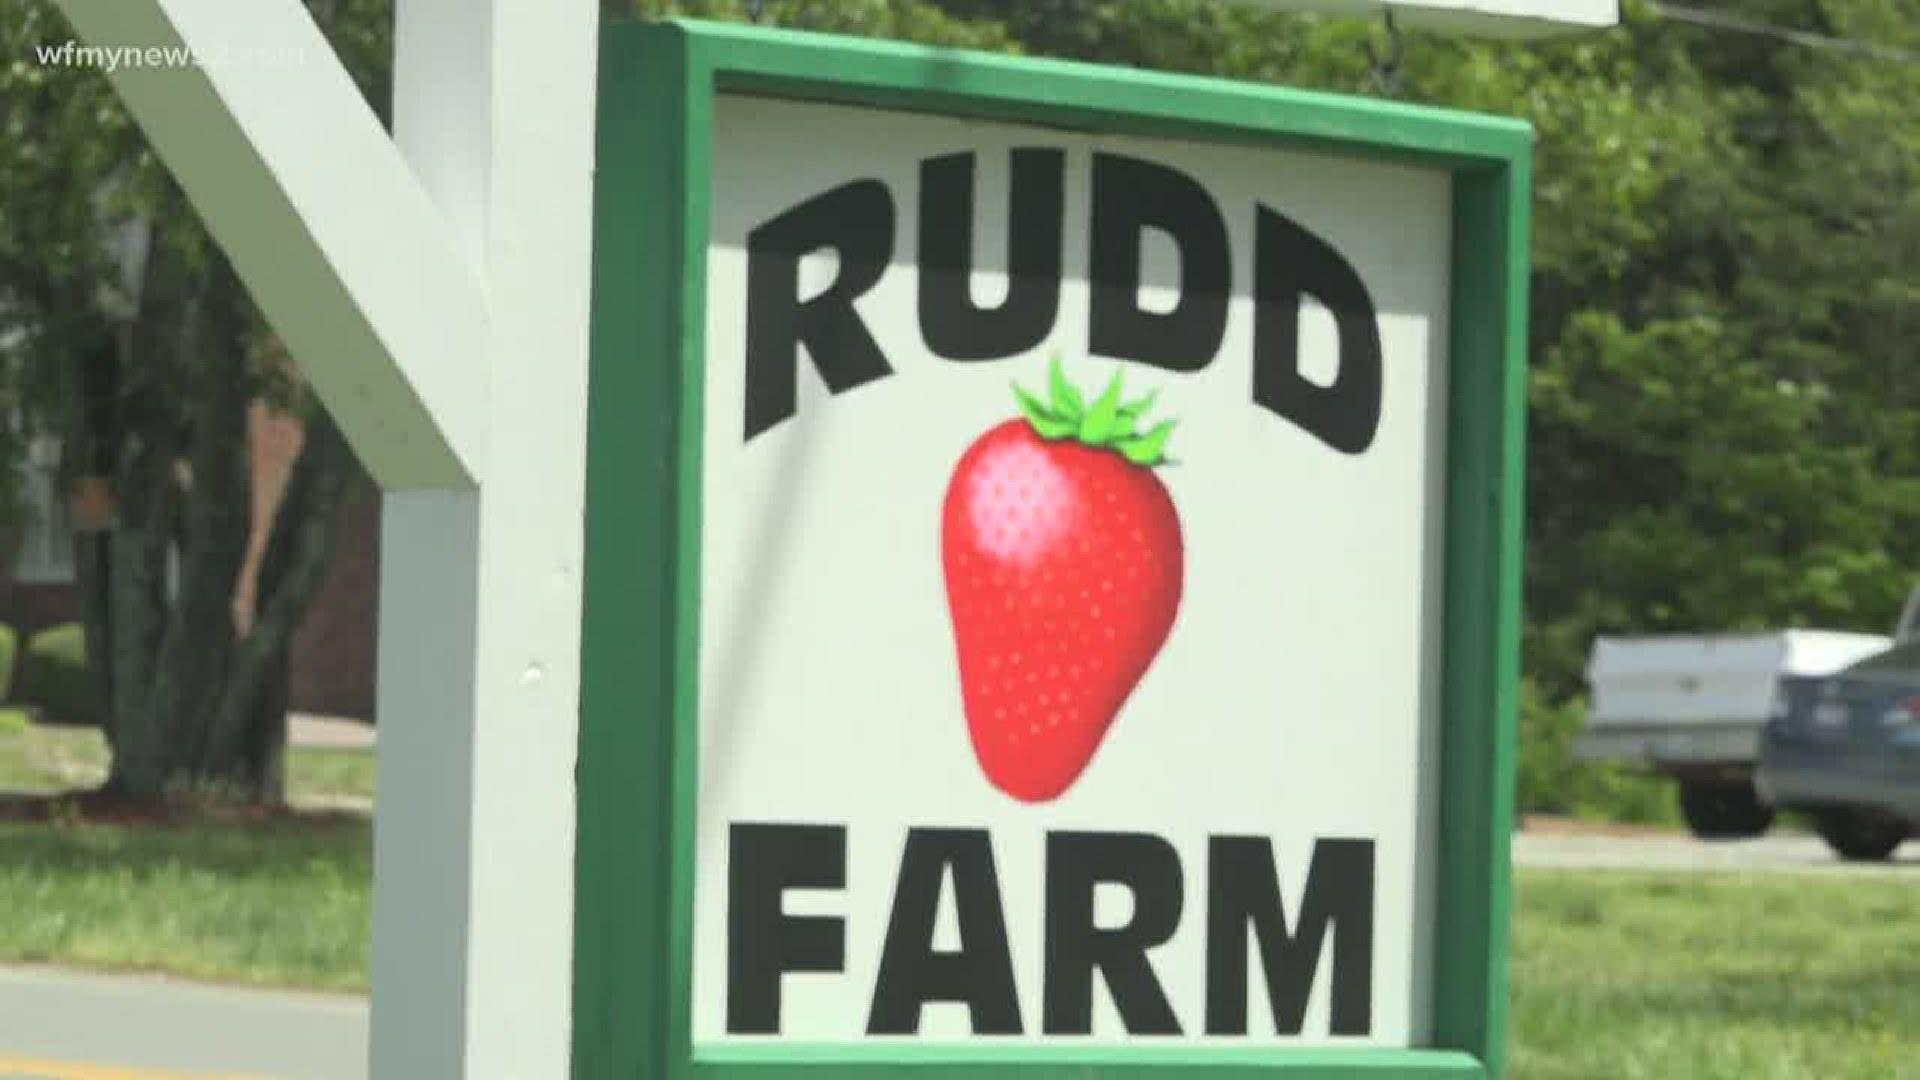 Rudd Farm In Greensboro Reopens For Drive Thru Strawberries Wfmynews2 Com